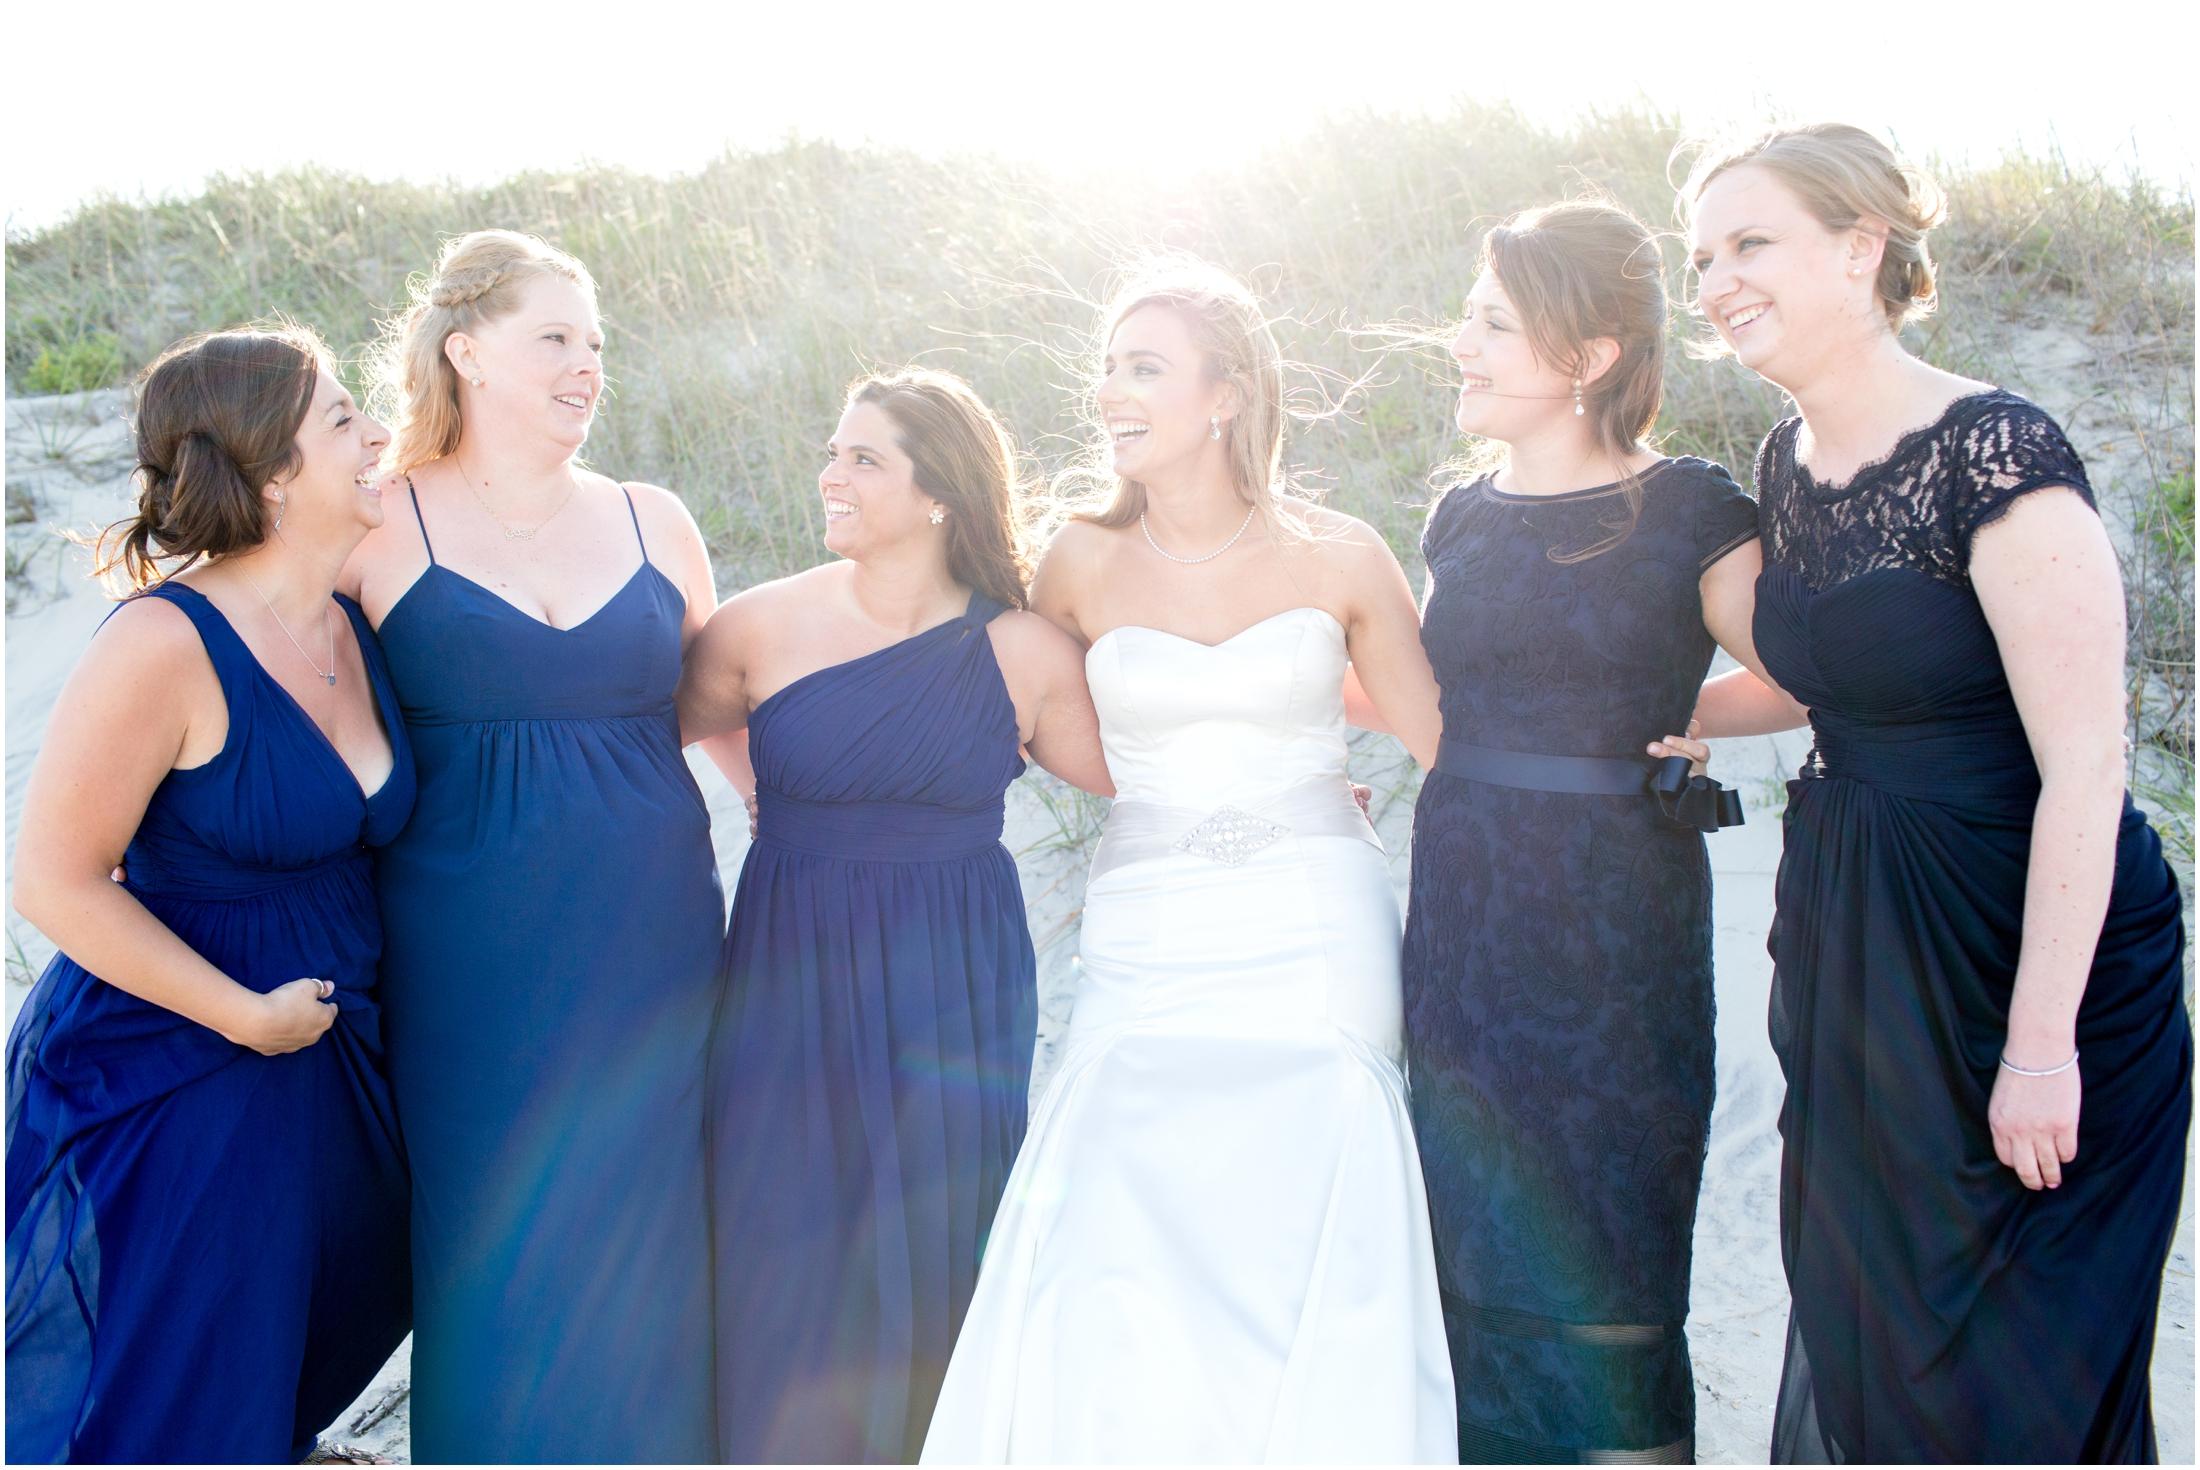 Pearce-Wedding-Bridal-Party-630.jpg